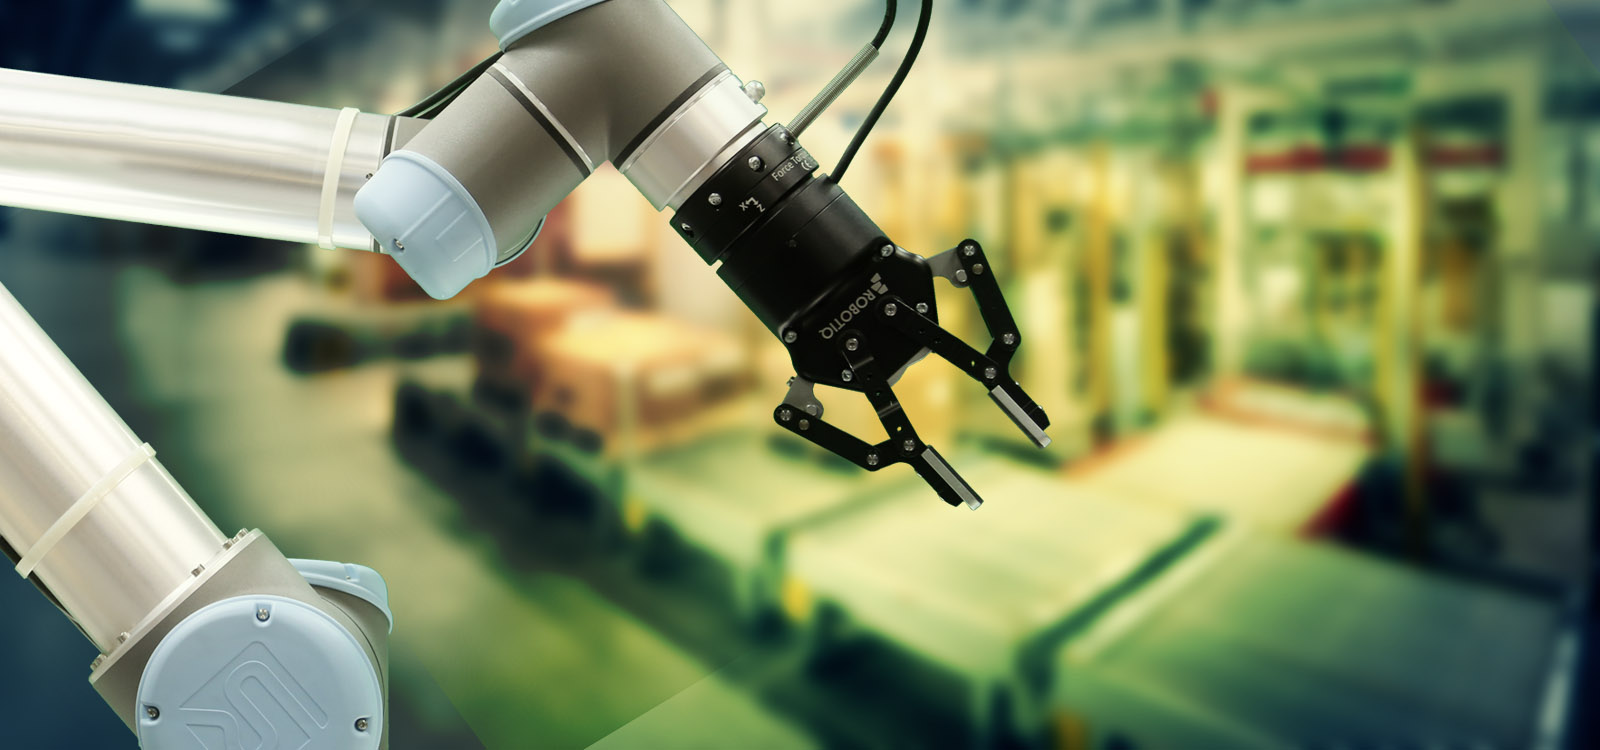 Universal Robot UR5 cobot Concept Robotics